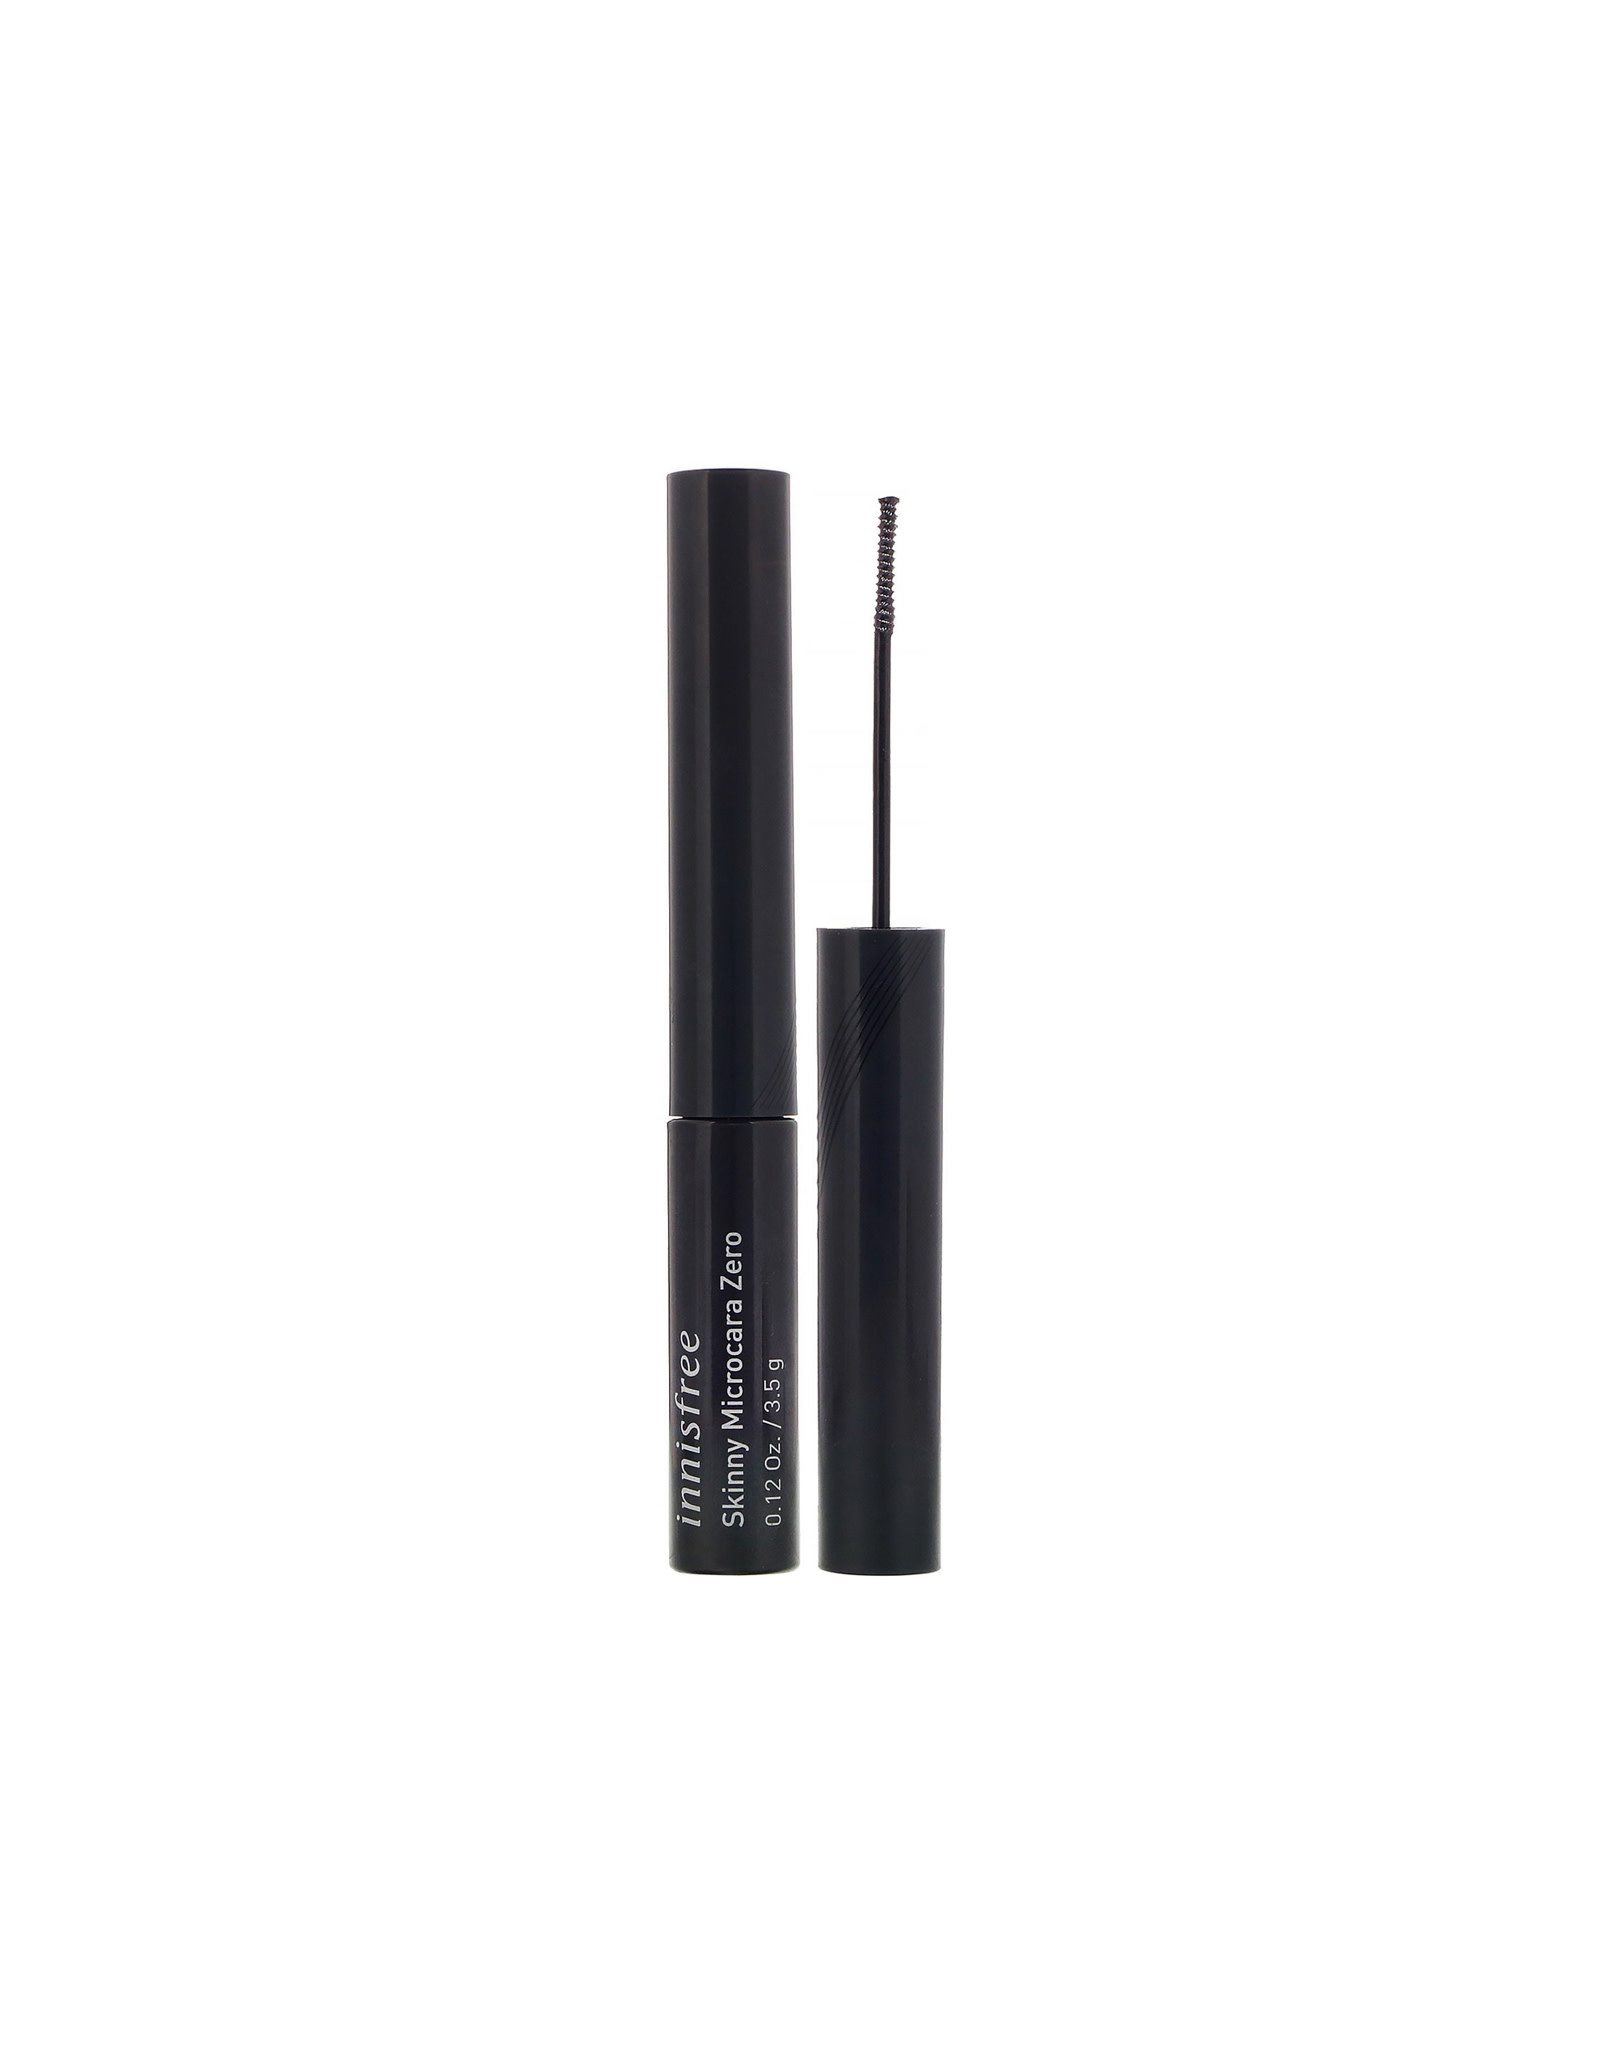 Innisfree Skinny Microcara Zero Waterproof Mascara Black